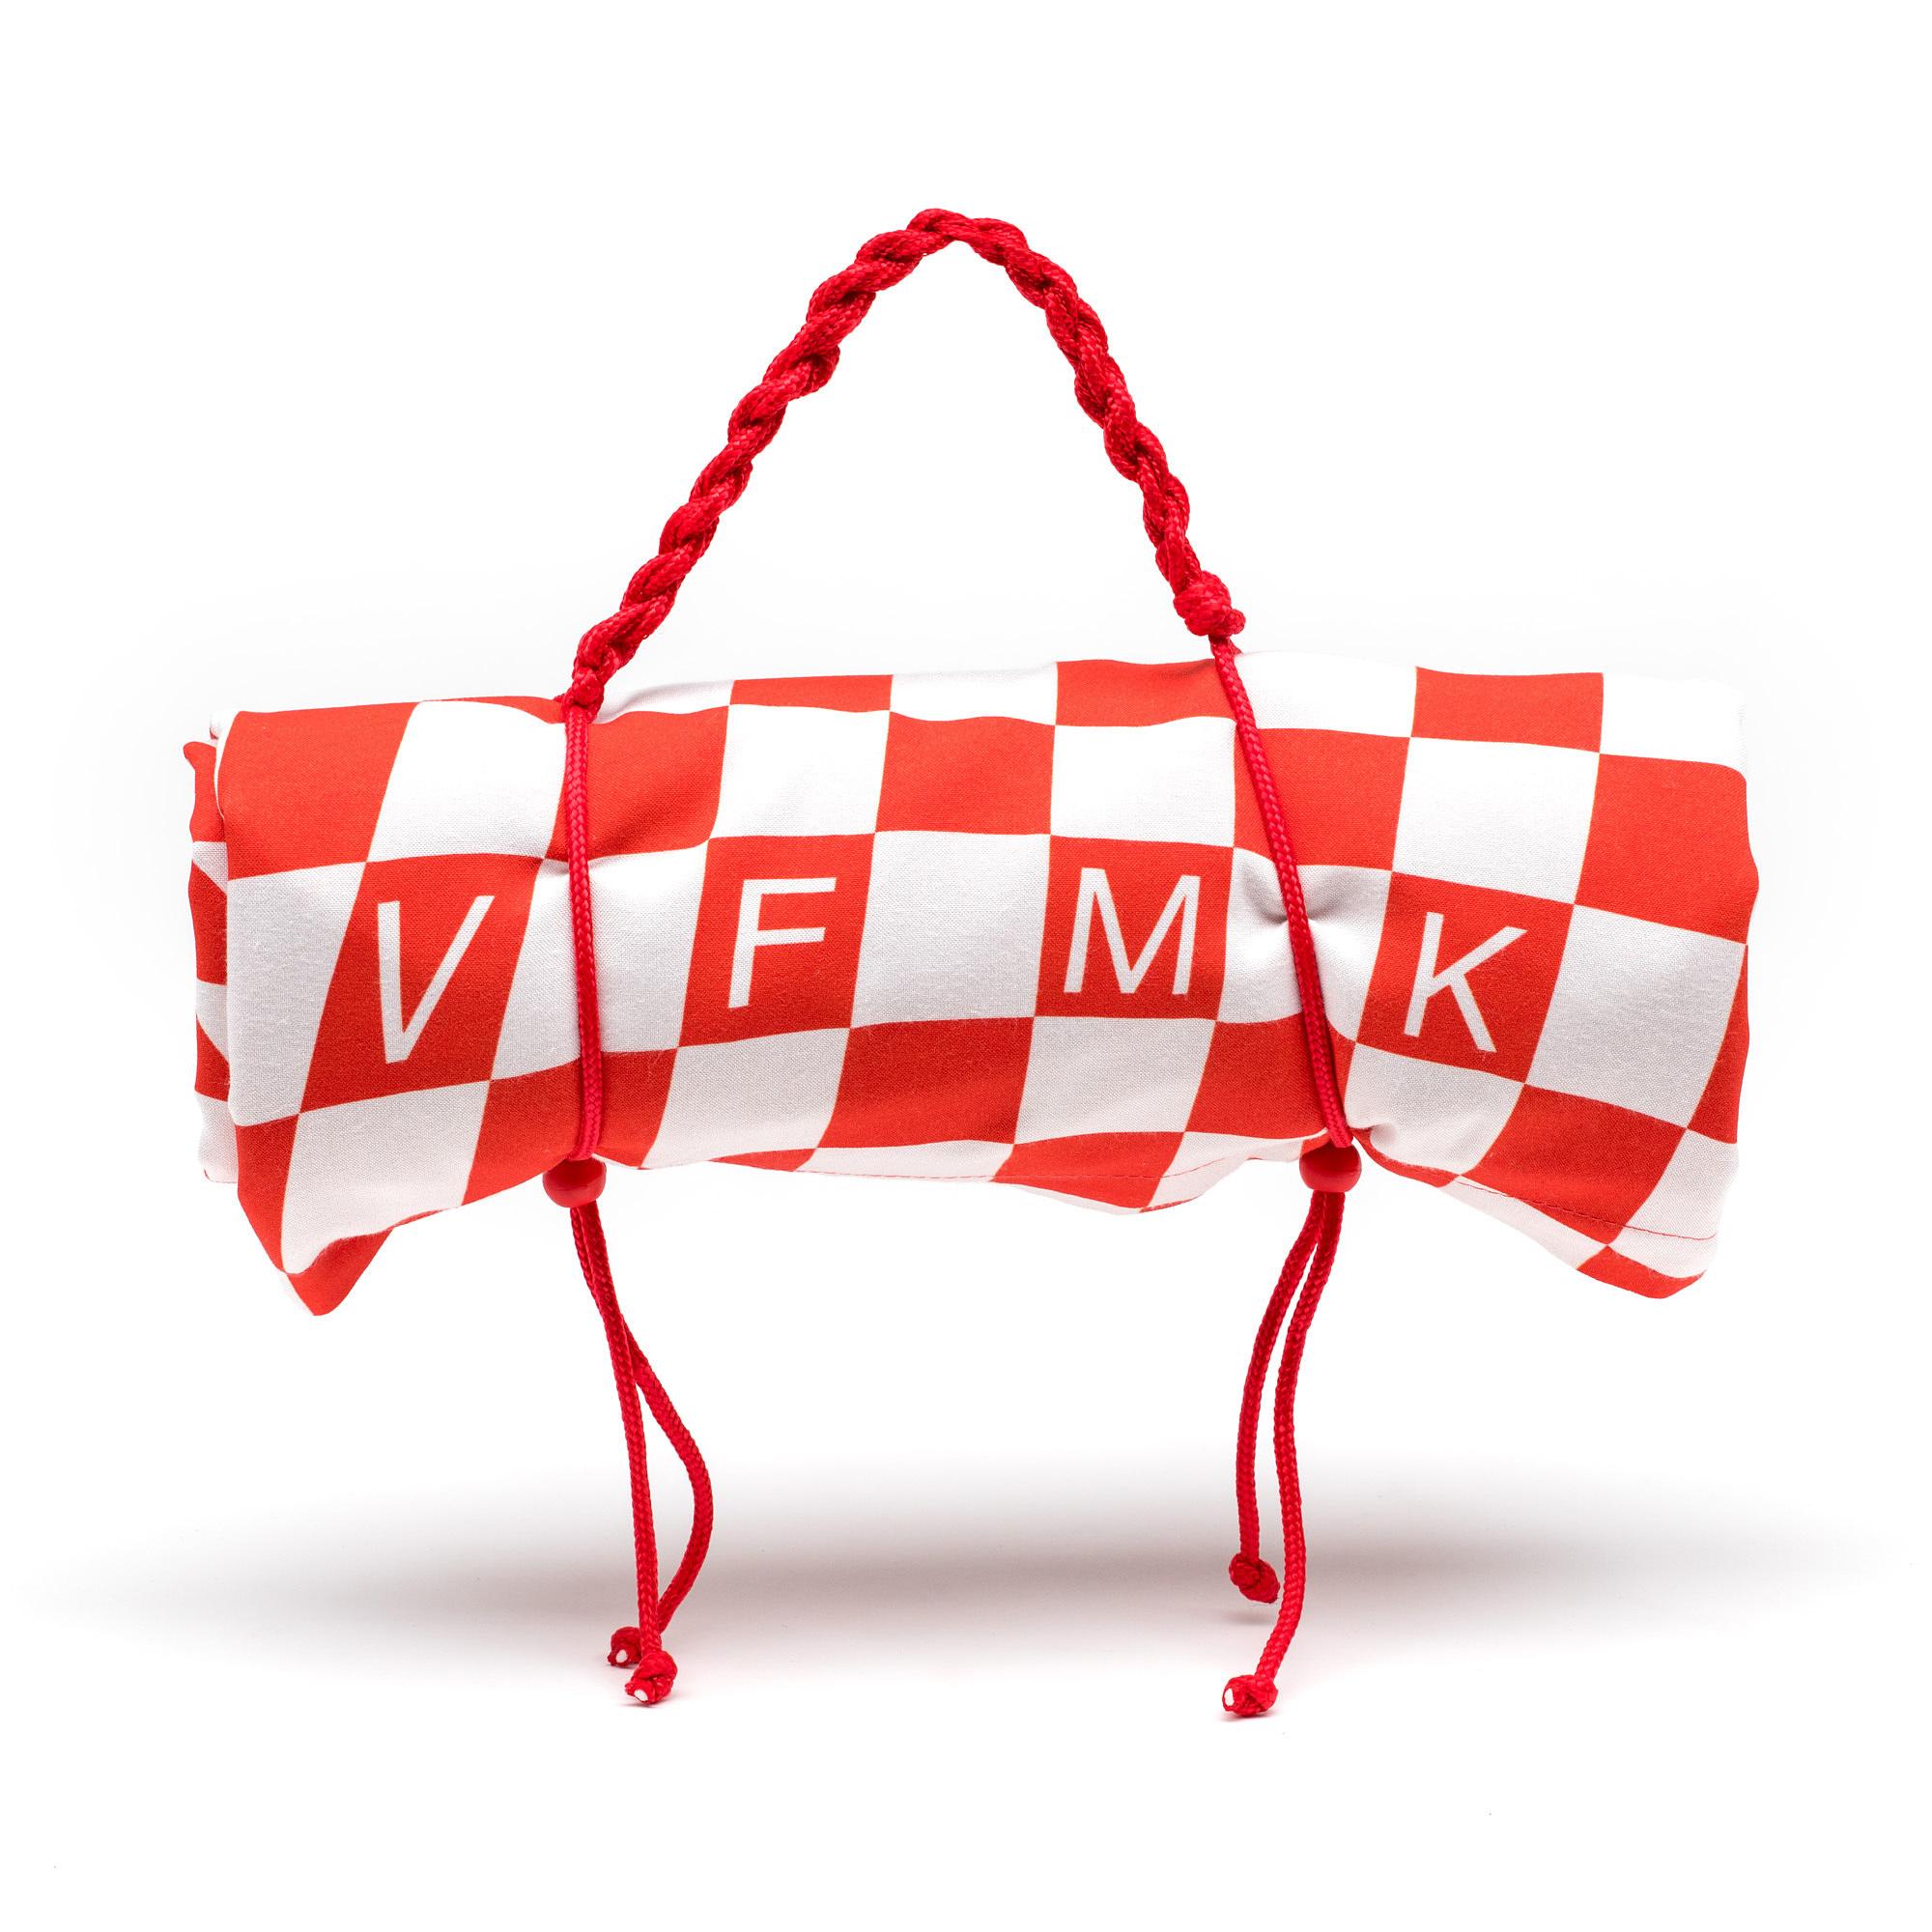 Vfm K Shop 276